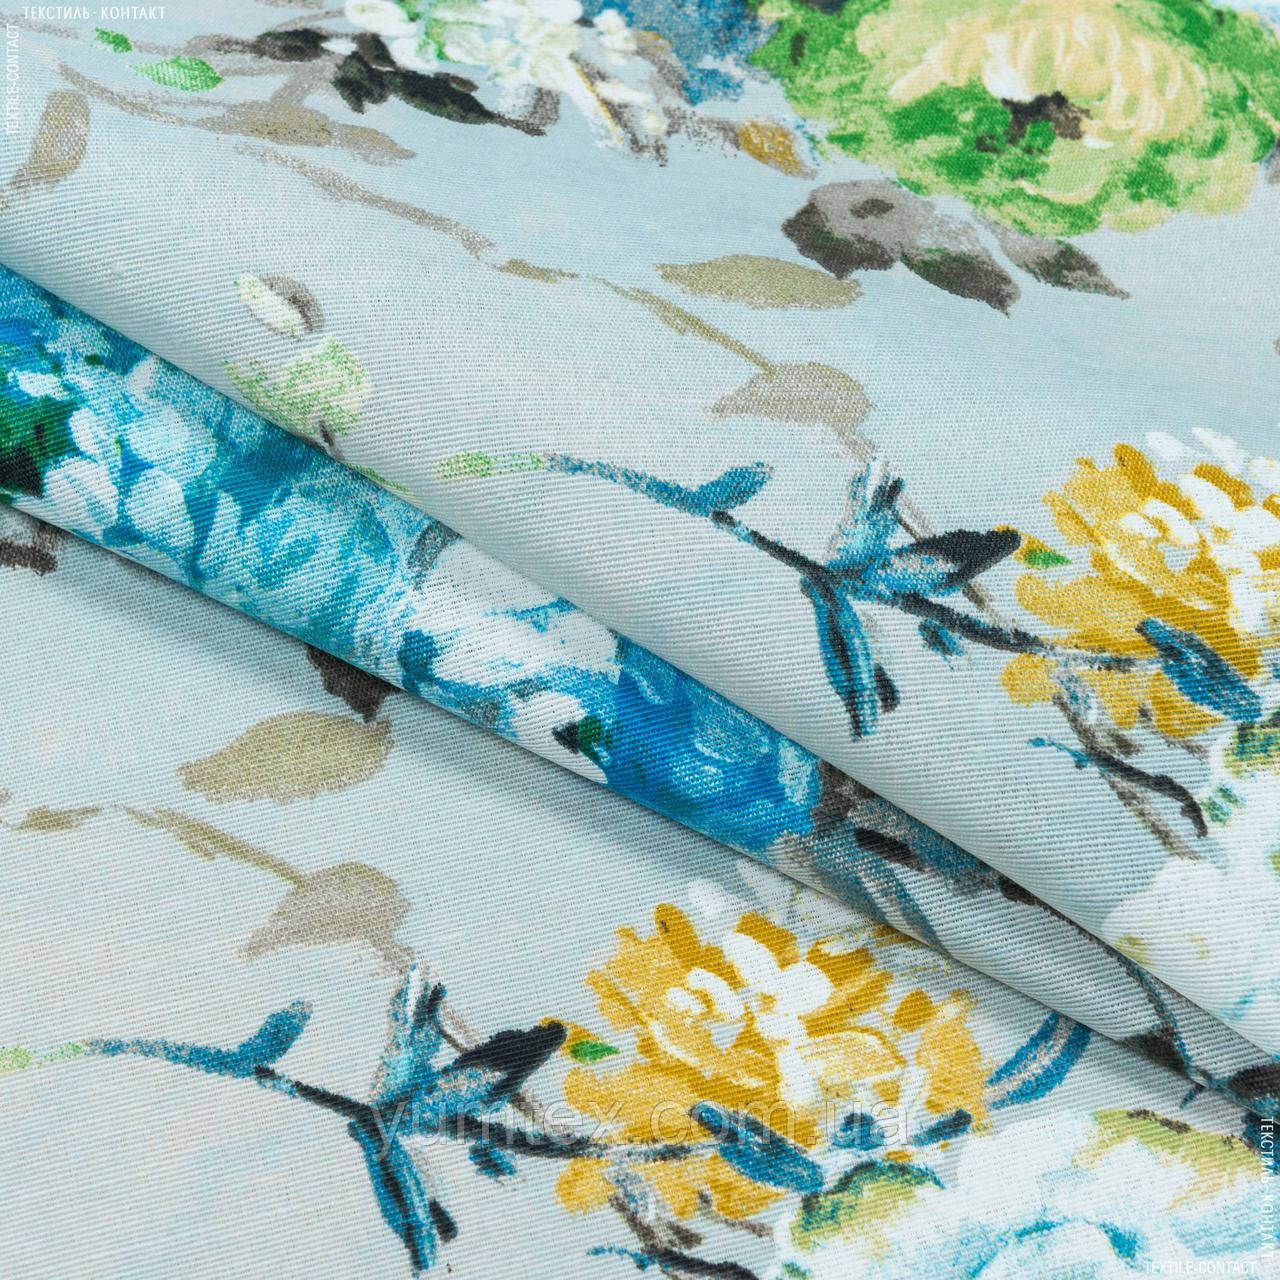 Декоративная ткань  лонета каролина/carolina  цветы синий,карамель,т.беж 148872